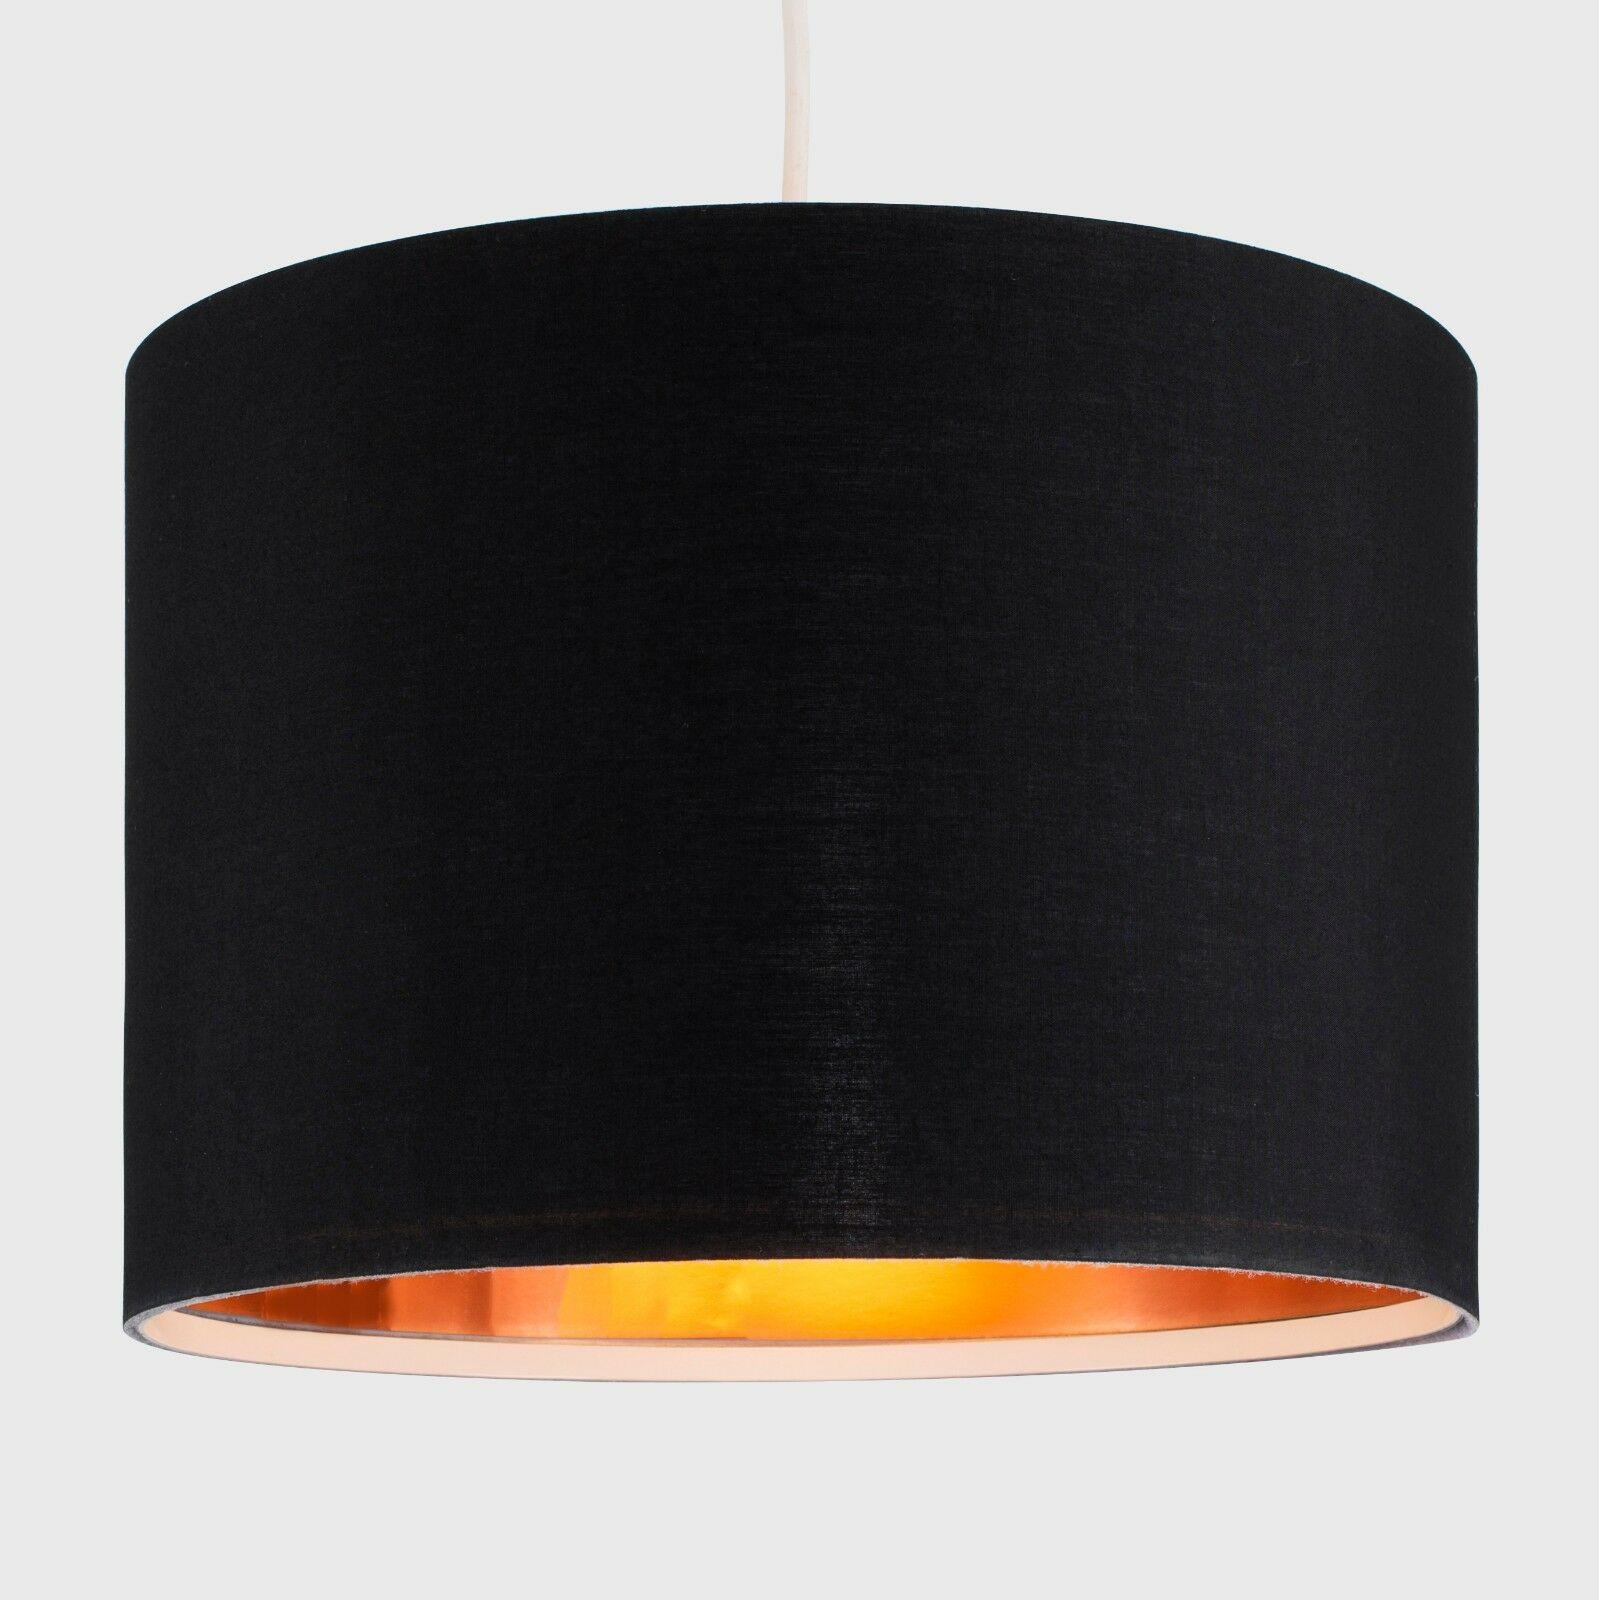 Tela-moderna-algodon-facil-ajuste-Techo-Colgante-Pantalla-De-Mesa-tonos-de-luz-de-tambor miniatura 34